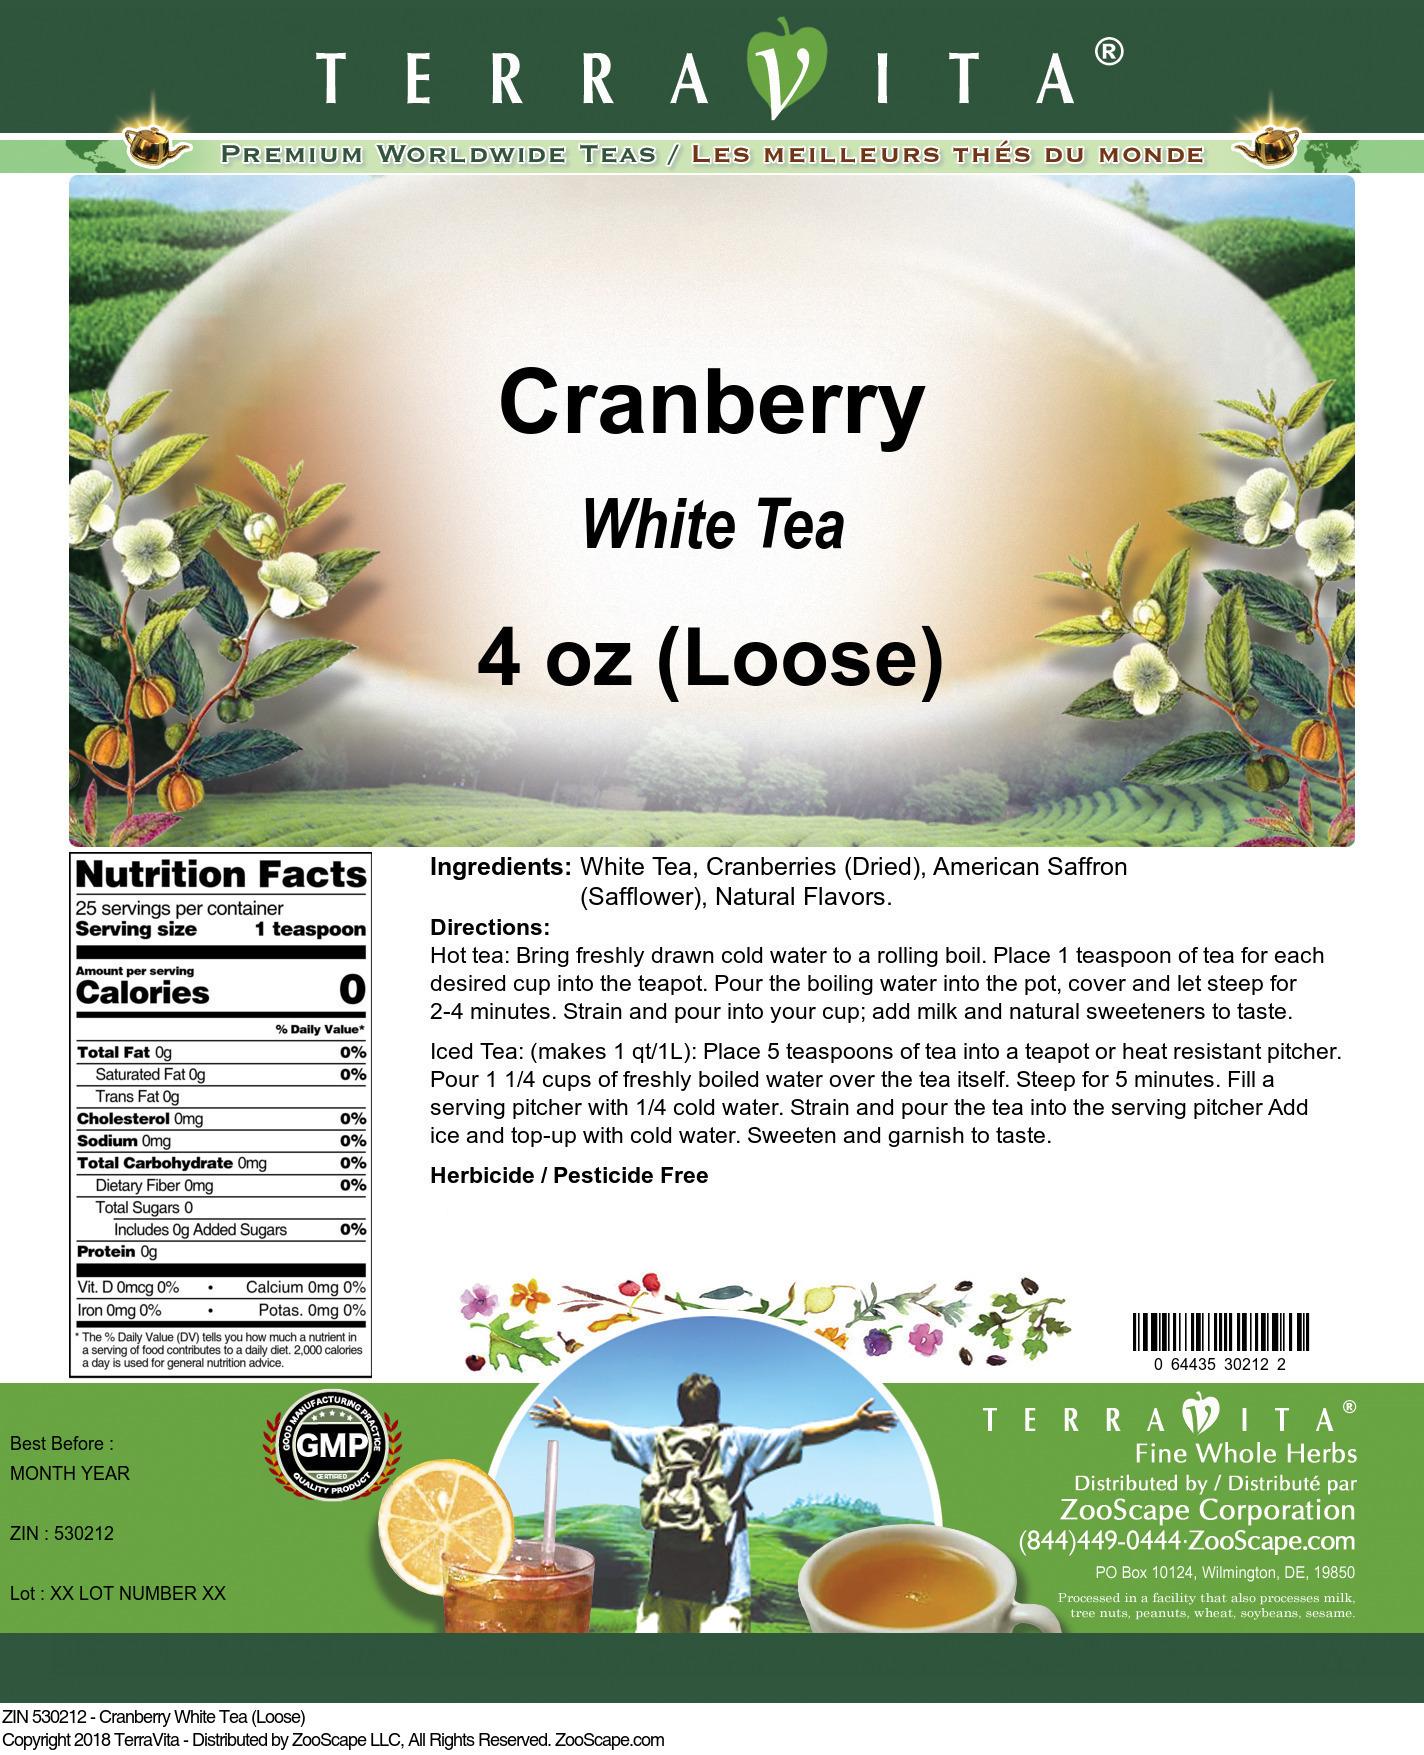 Cranberry White Tea (Loose)